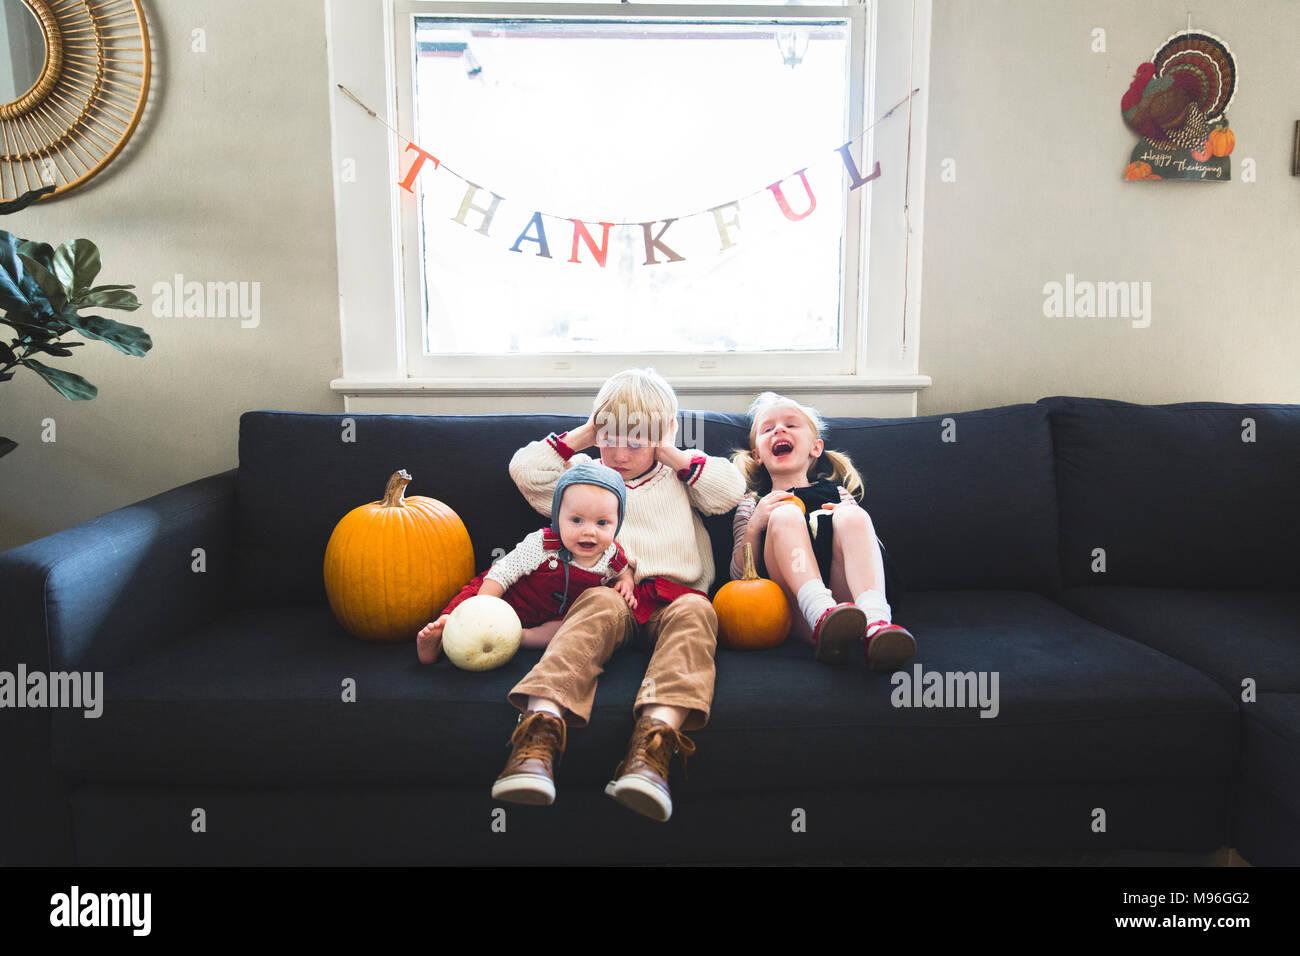 Children sitting underneath thankful banner with pumpkins - Stock Image